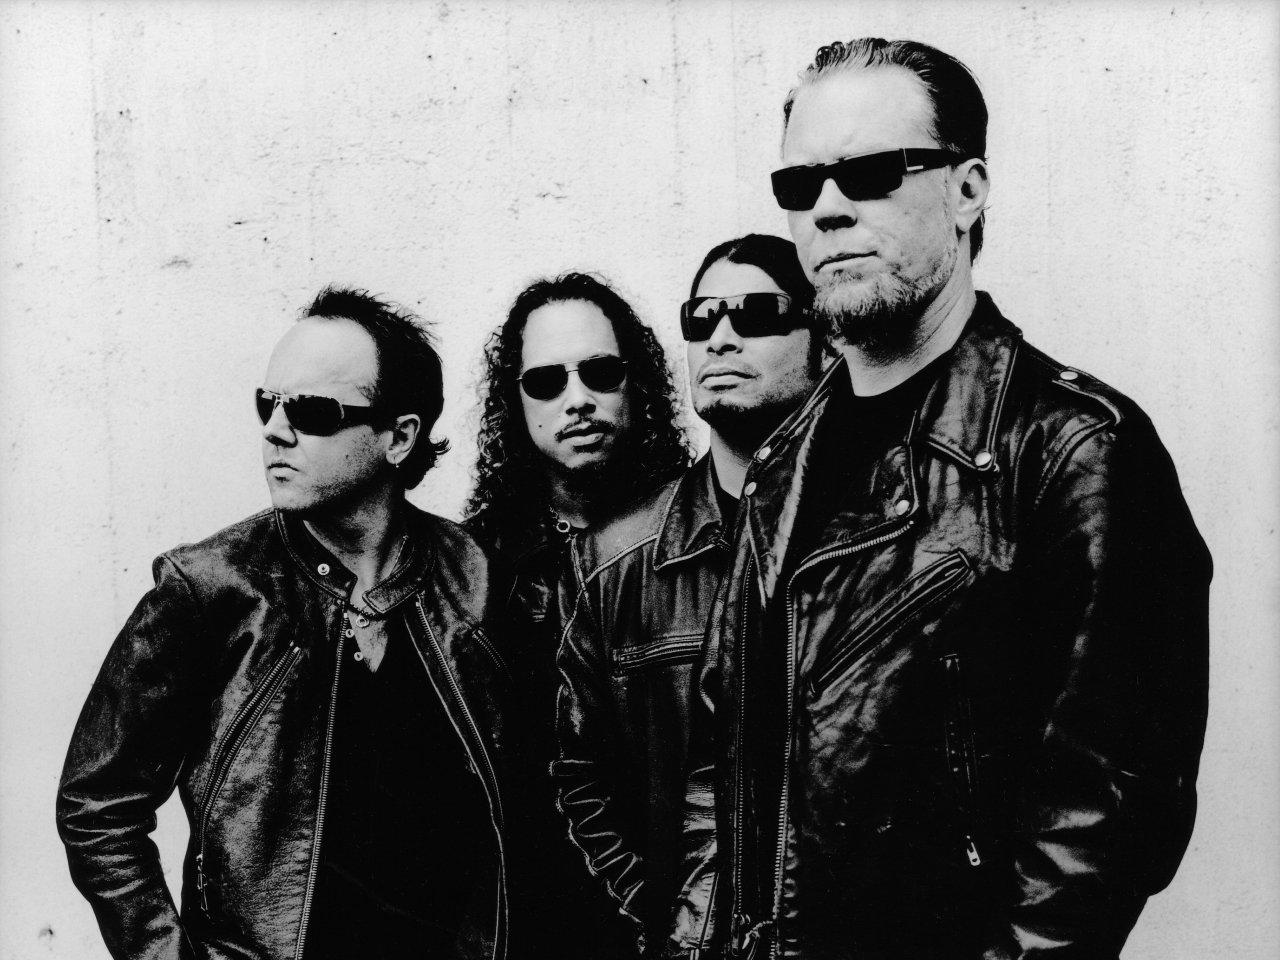 Metallica, Linkin Park, Deftones, And No Doubt Set For